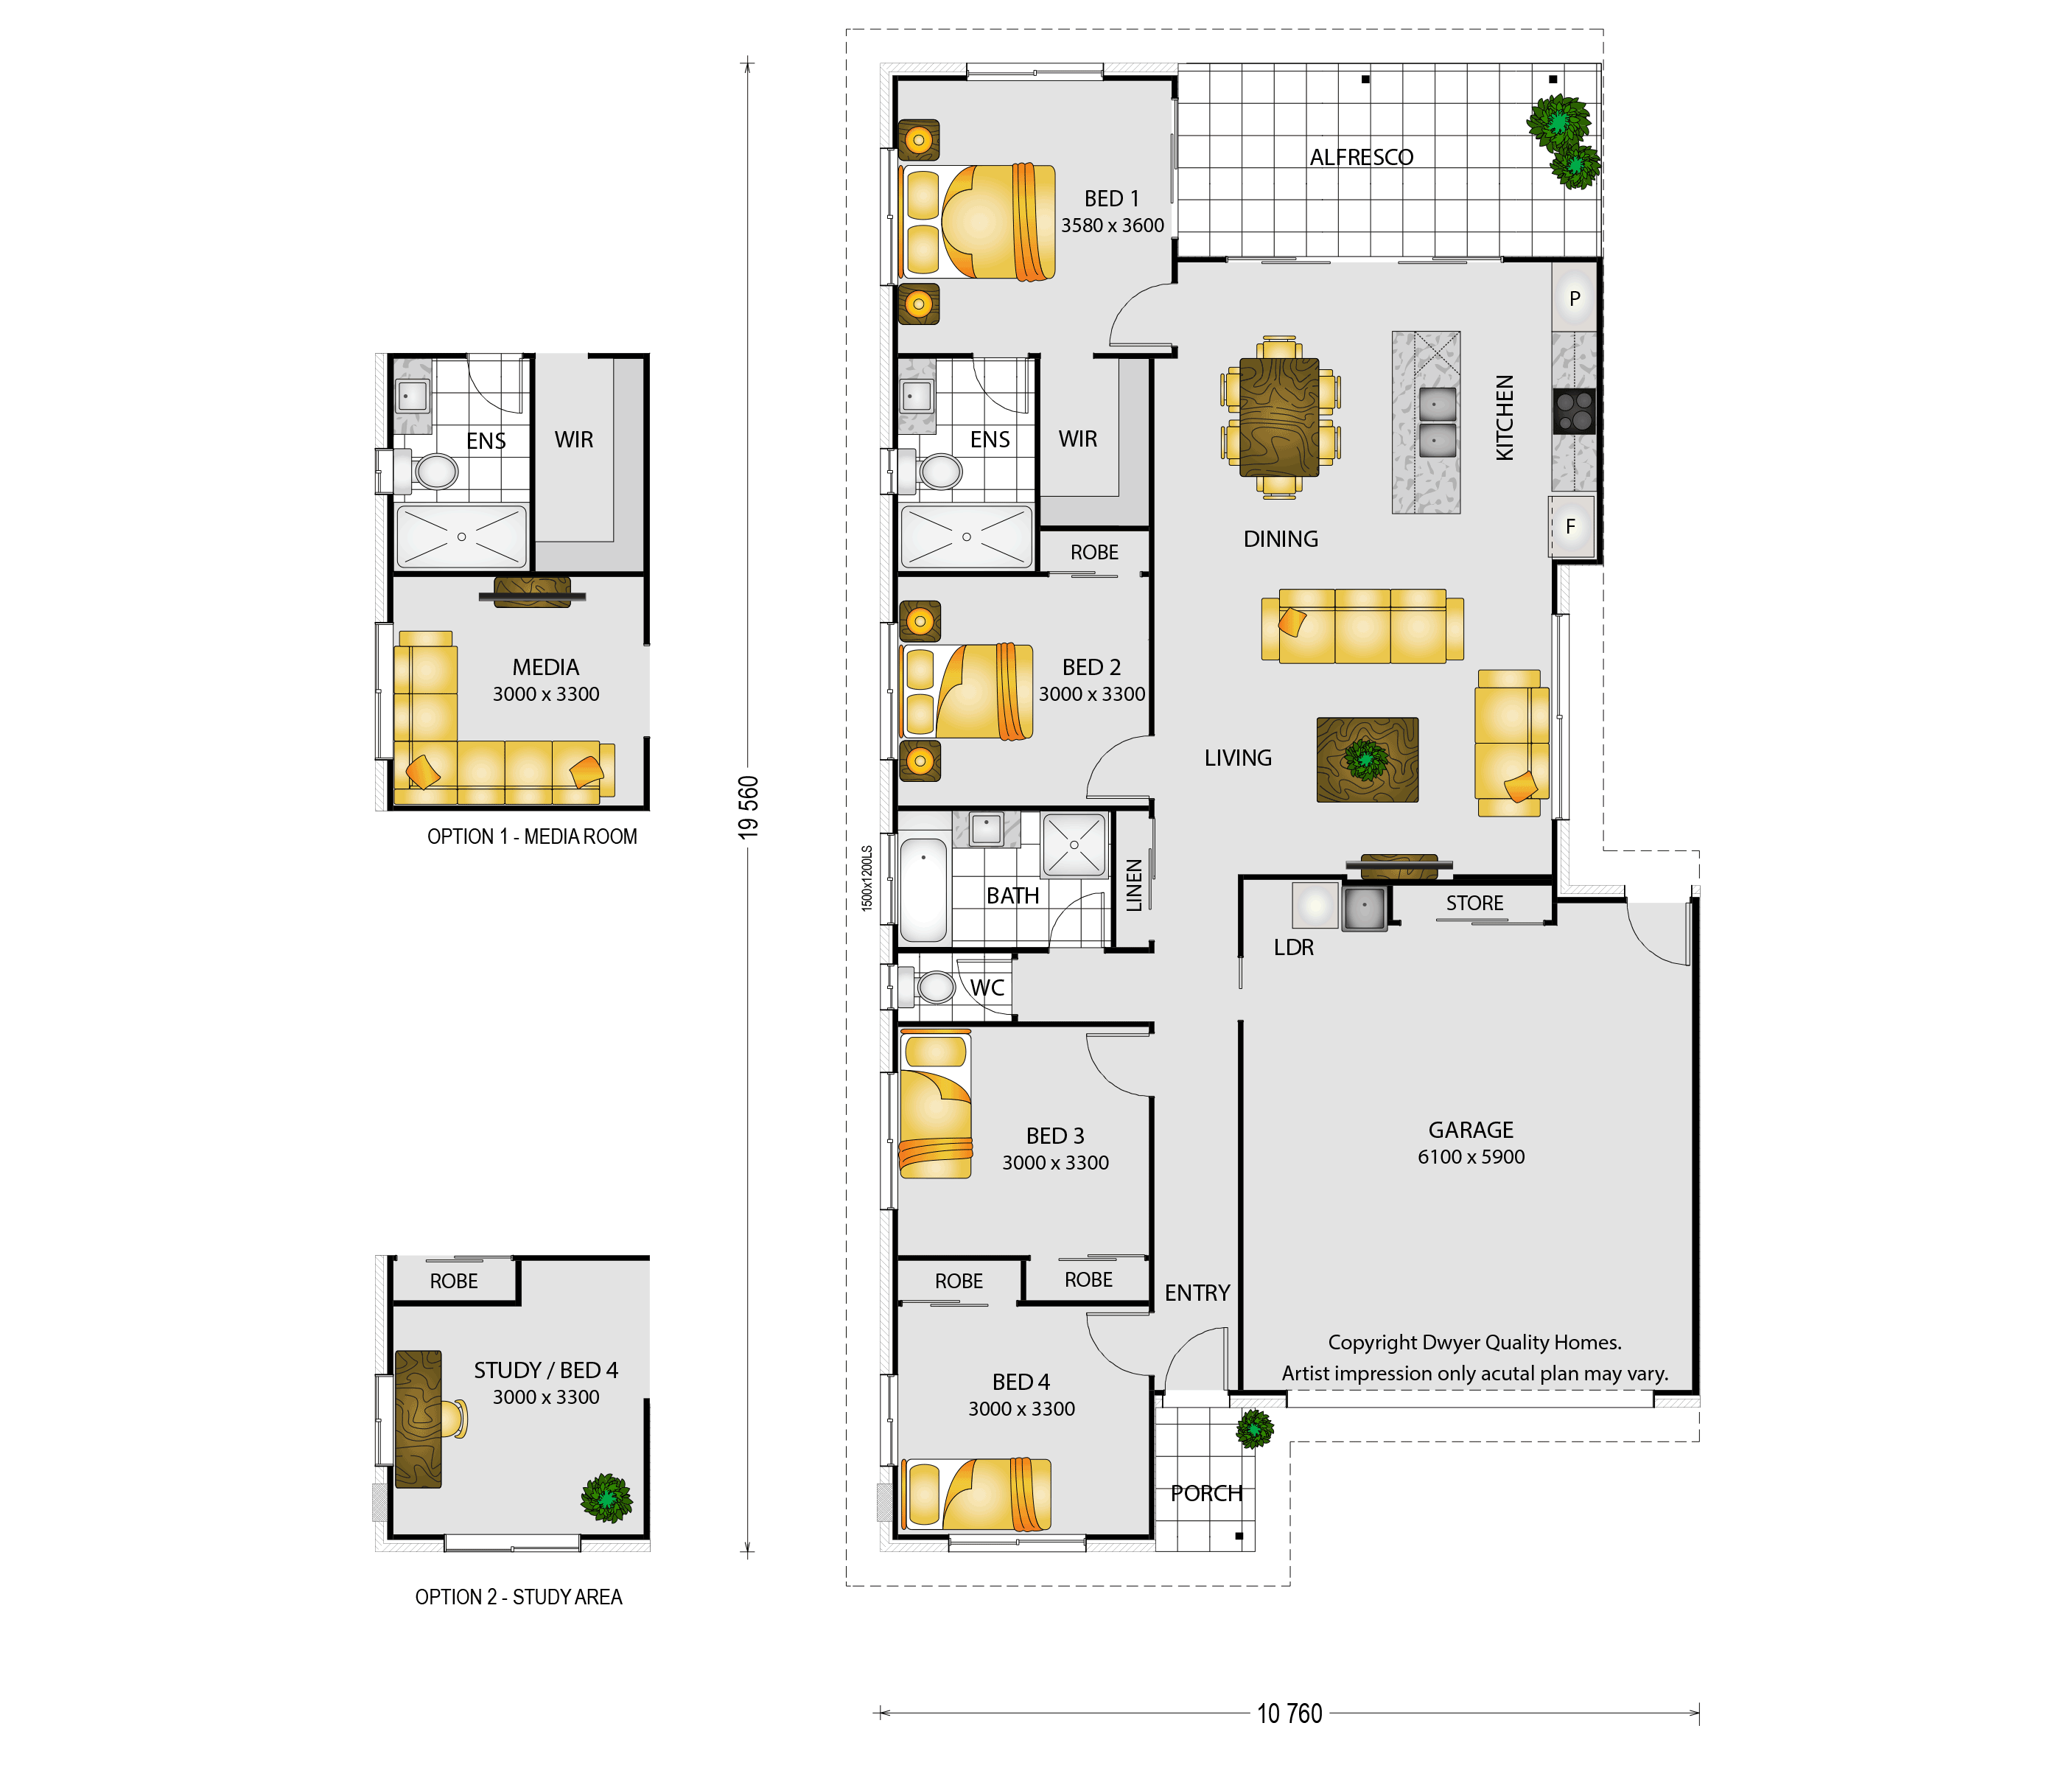 Forester - Floorplans